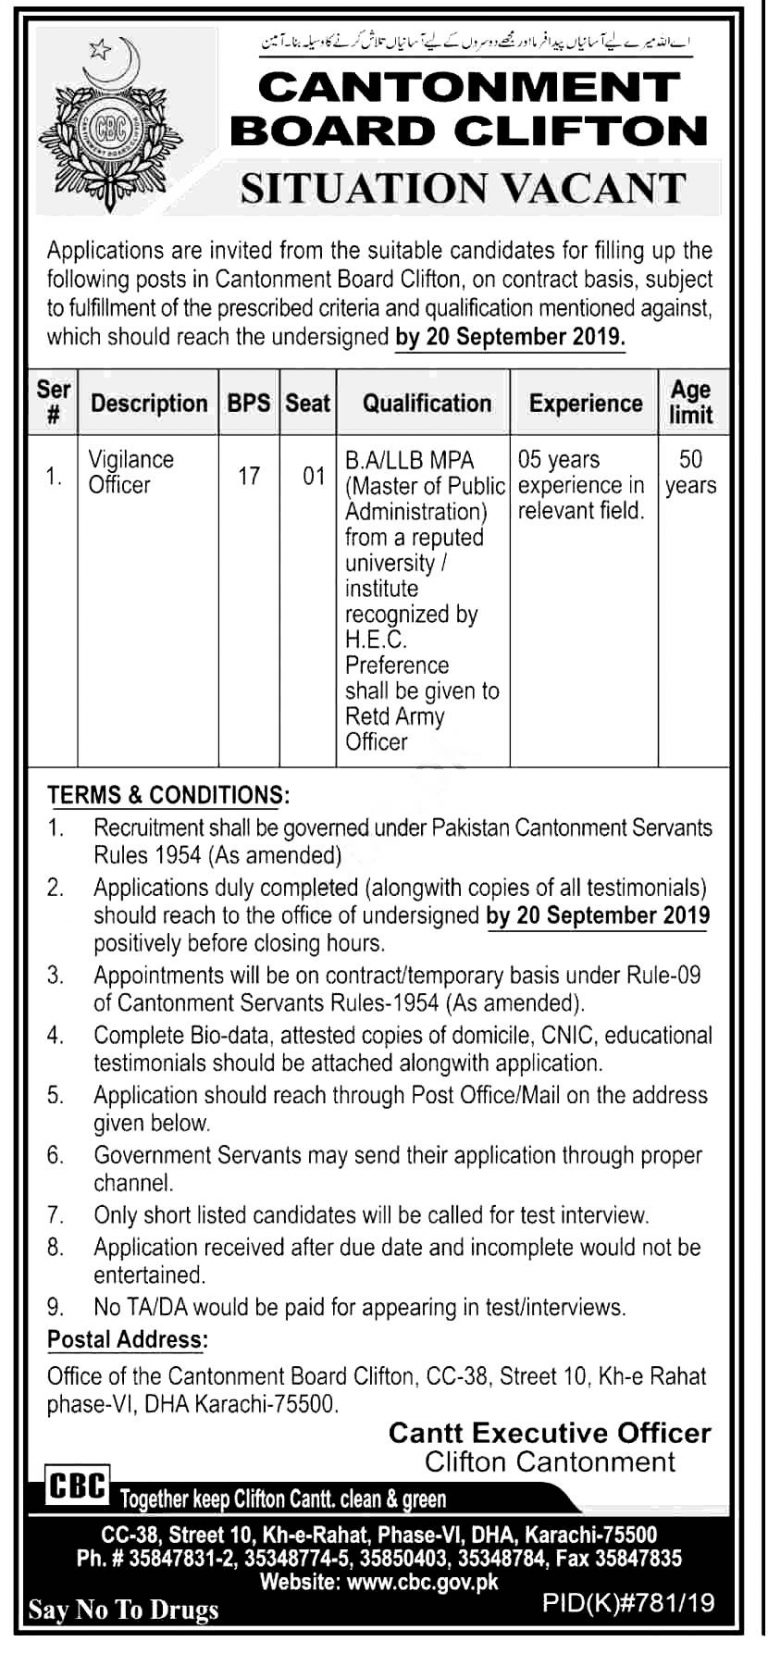 Cantonment Board Clifton Karachi CBC Jobs 2019 Latest www.cbc.gov.pk